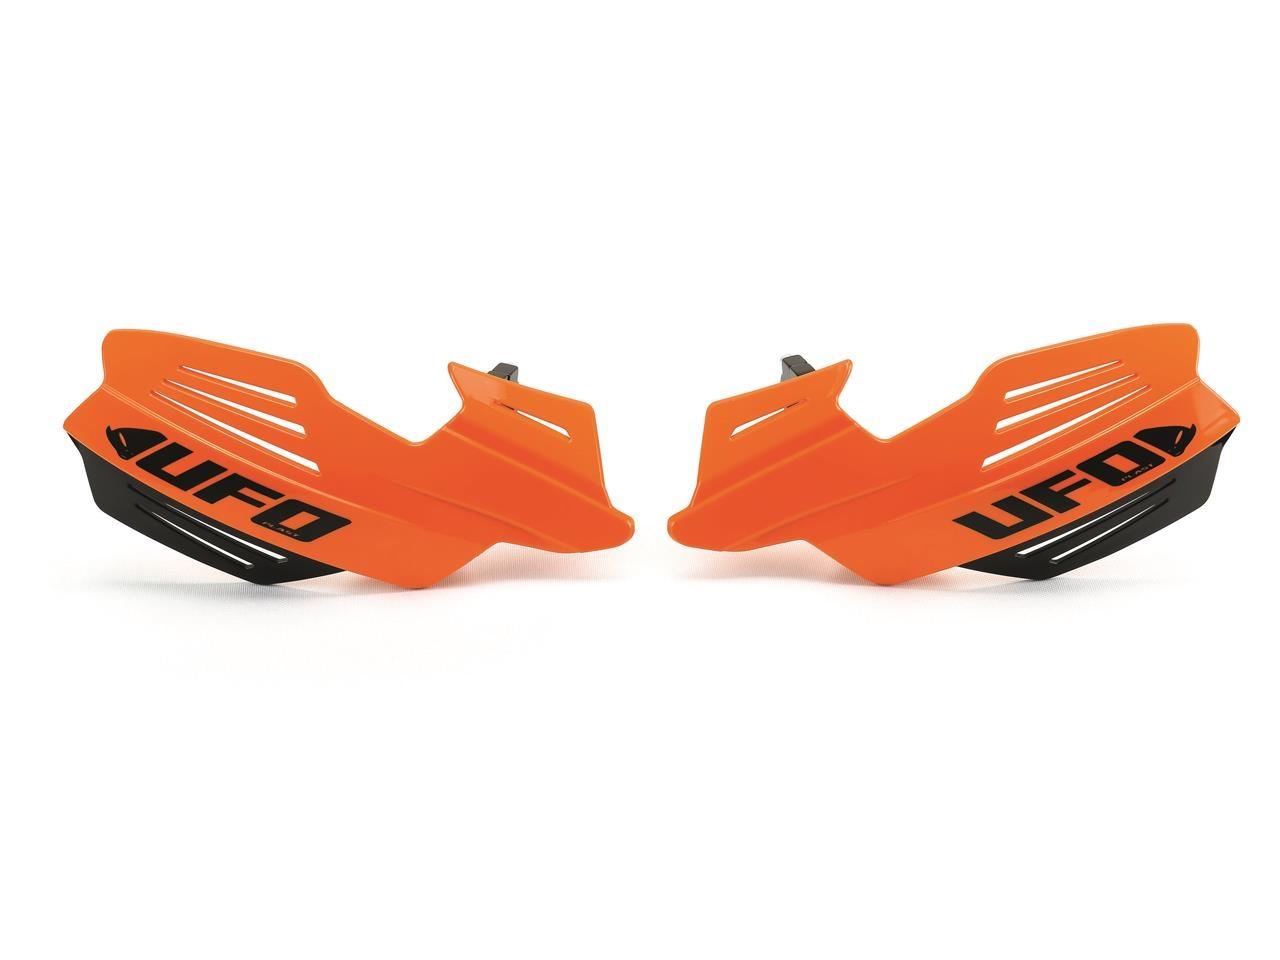 Protège-mains UFO Vulcan orange